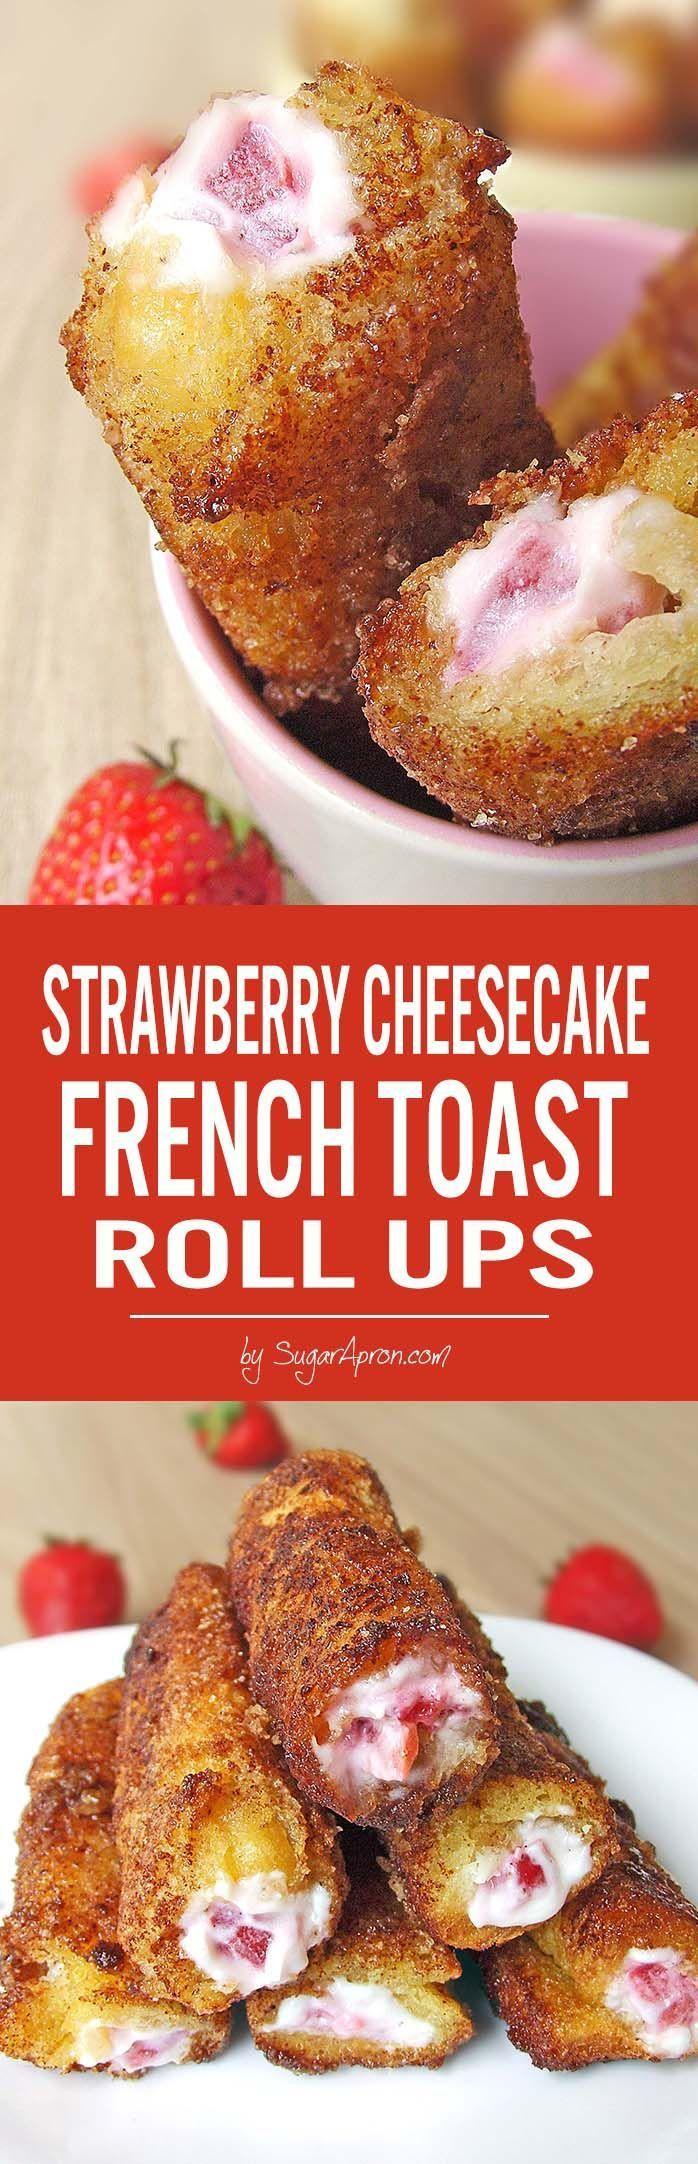 Strawberry French Toast Roll Ups - Sugar Apron #frenchtoastrollups